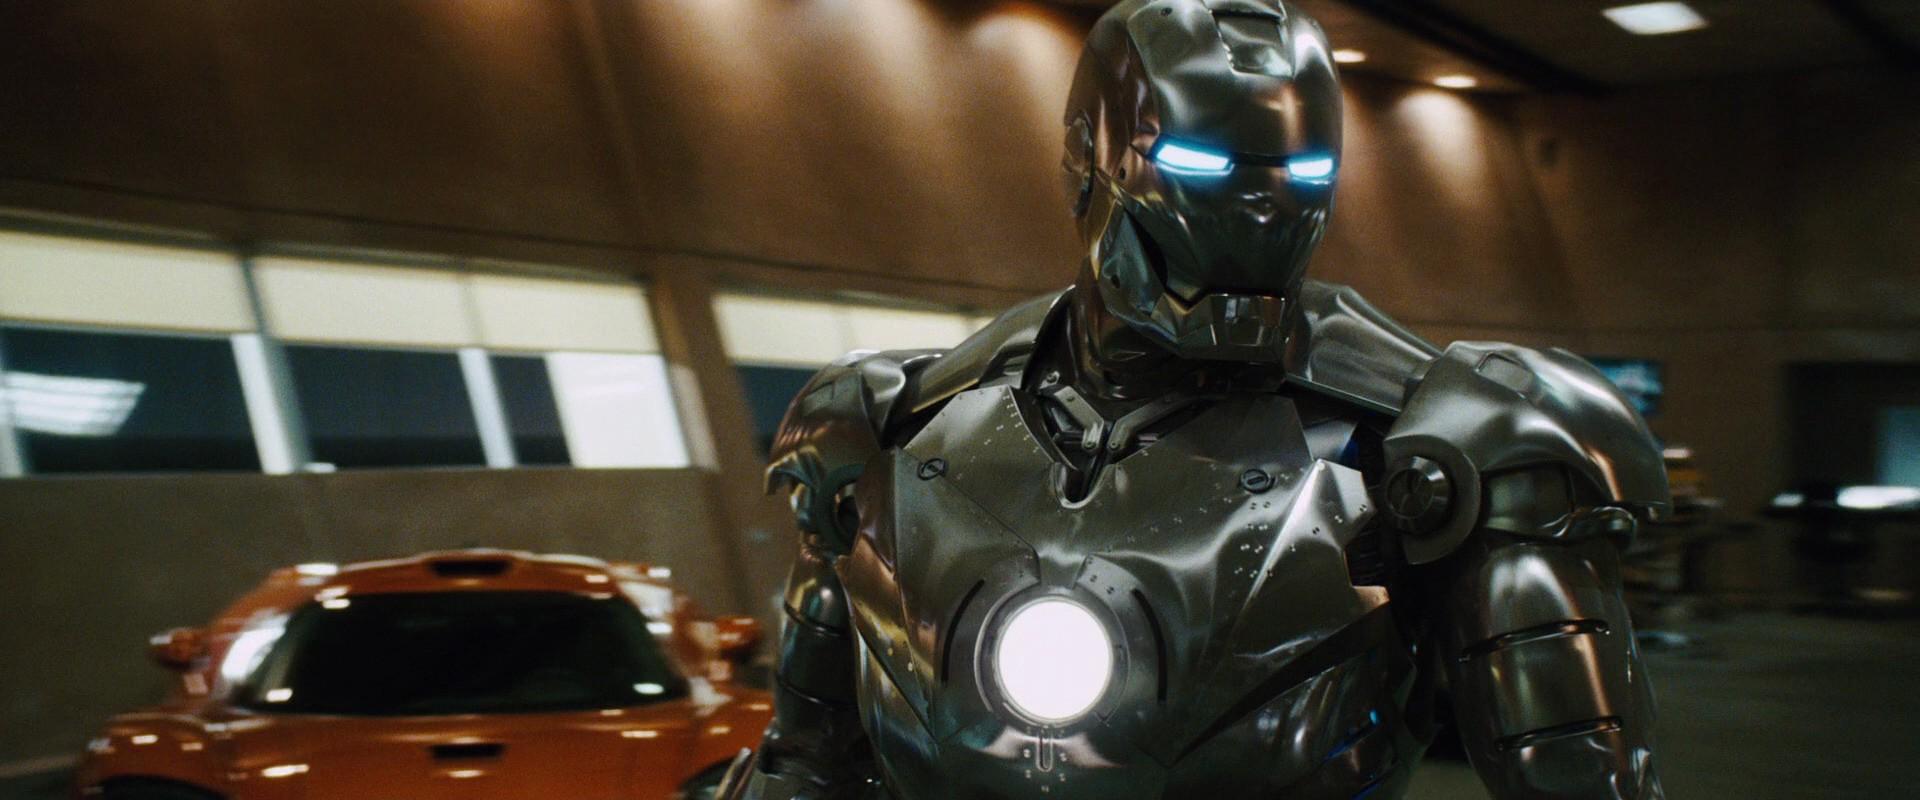 Image iron man1 movie screencaps com marvel - Iron man 1 images ...